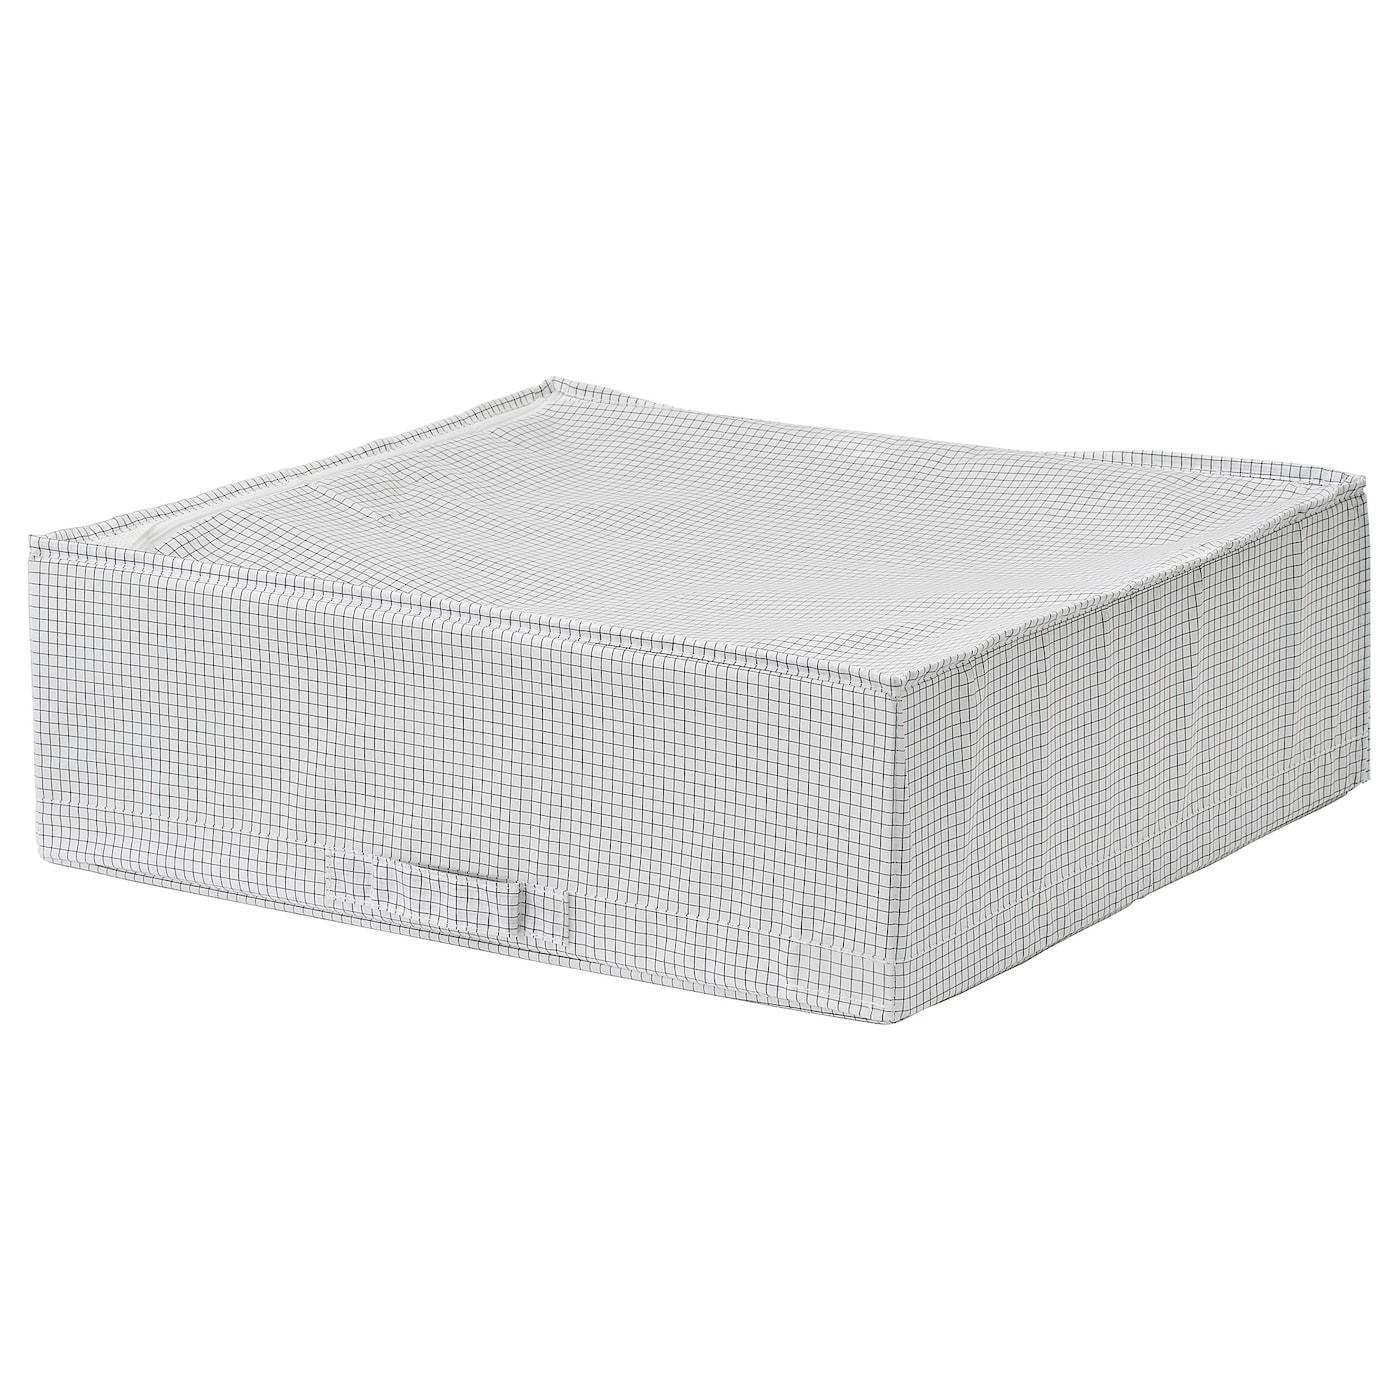 IKEA STUK Tasche – 55 x 51 x 18 cm